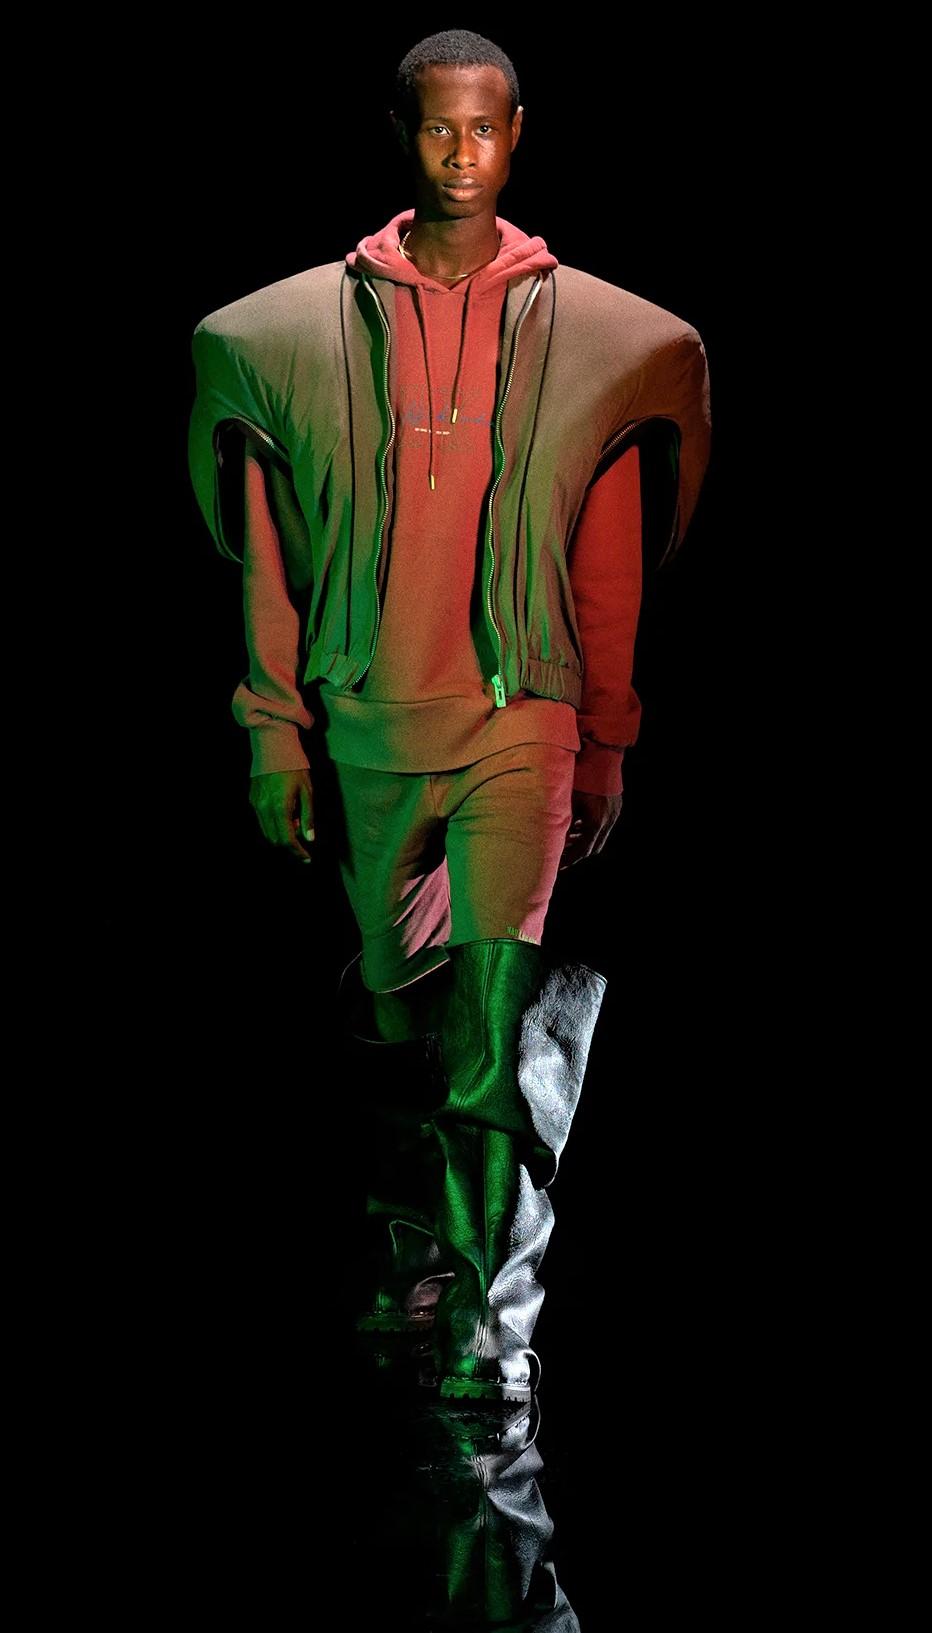 Han K MIlan Fashion week pynck menswear.jpg